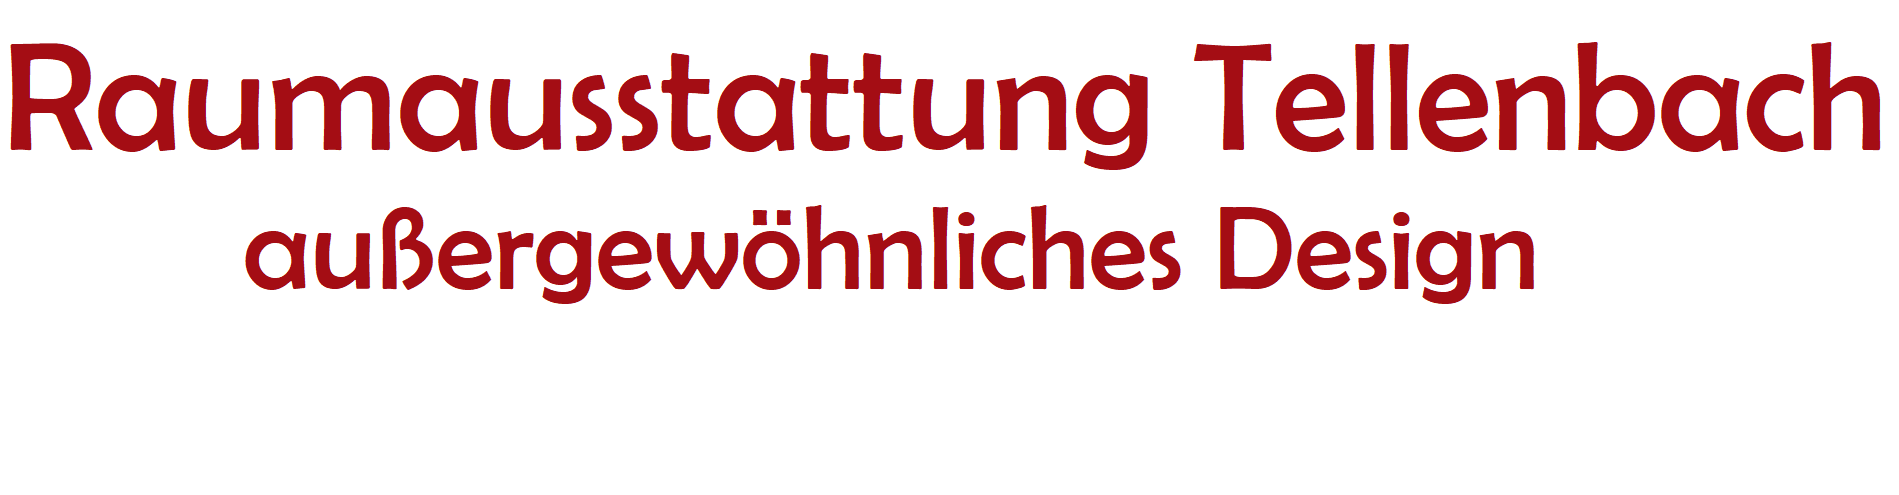 Gardinenstangen-Logo